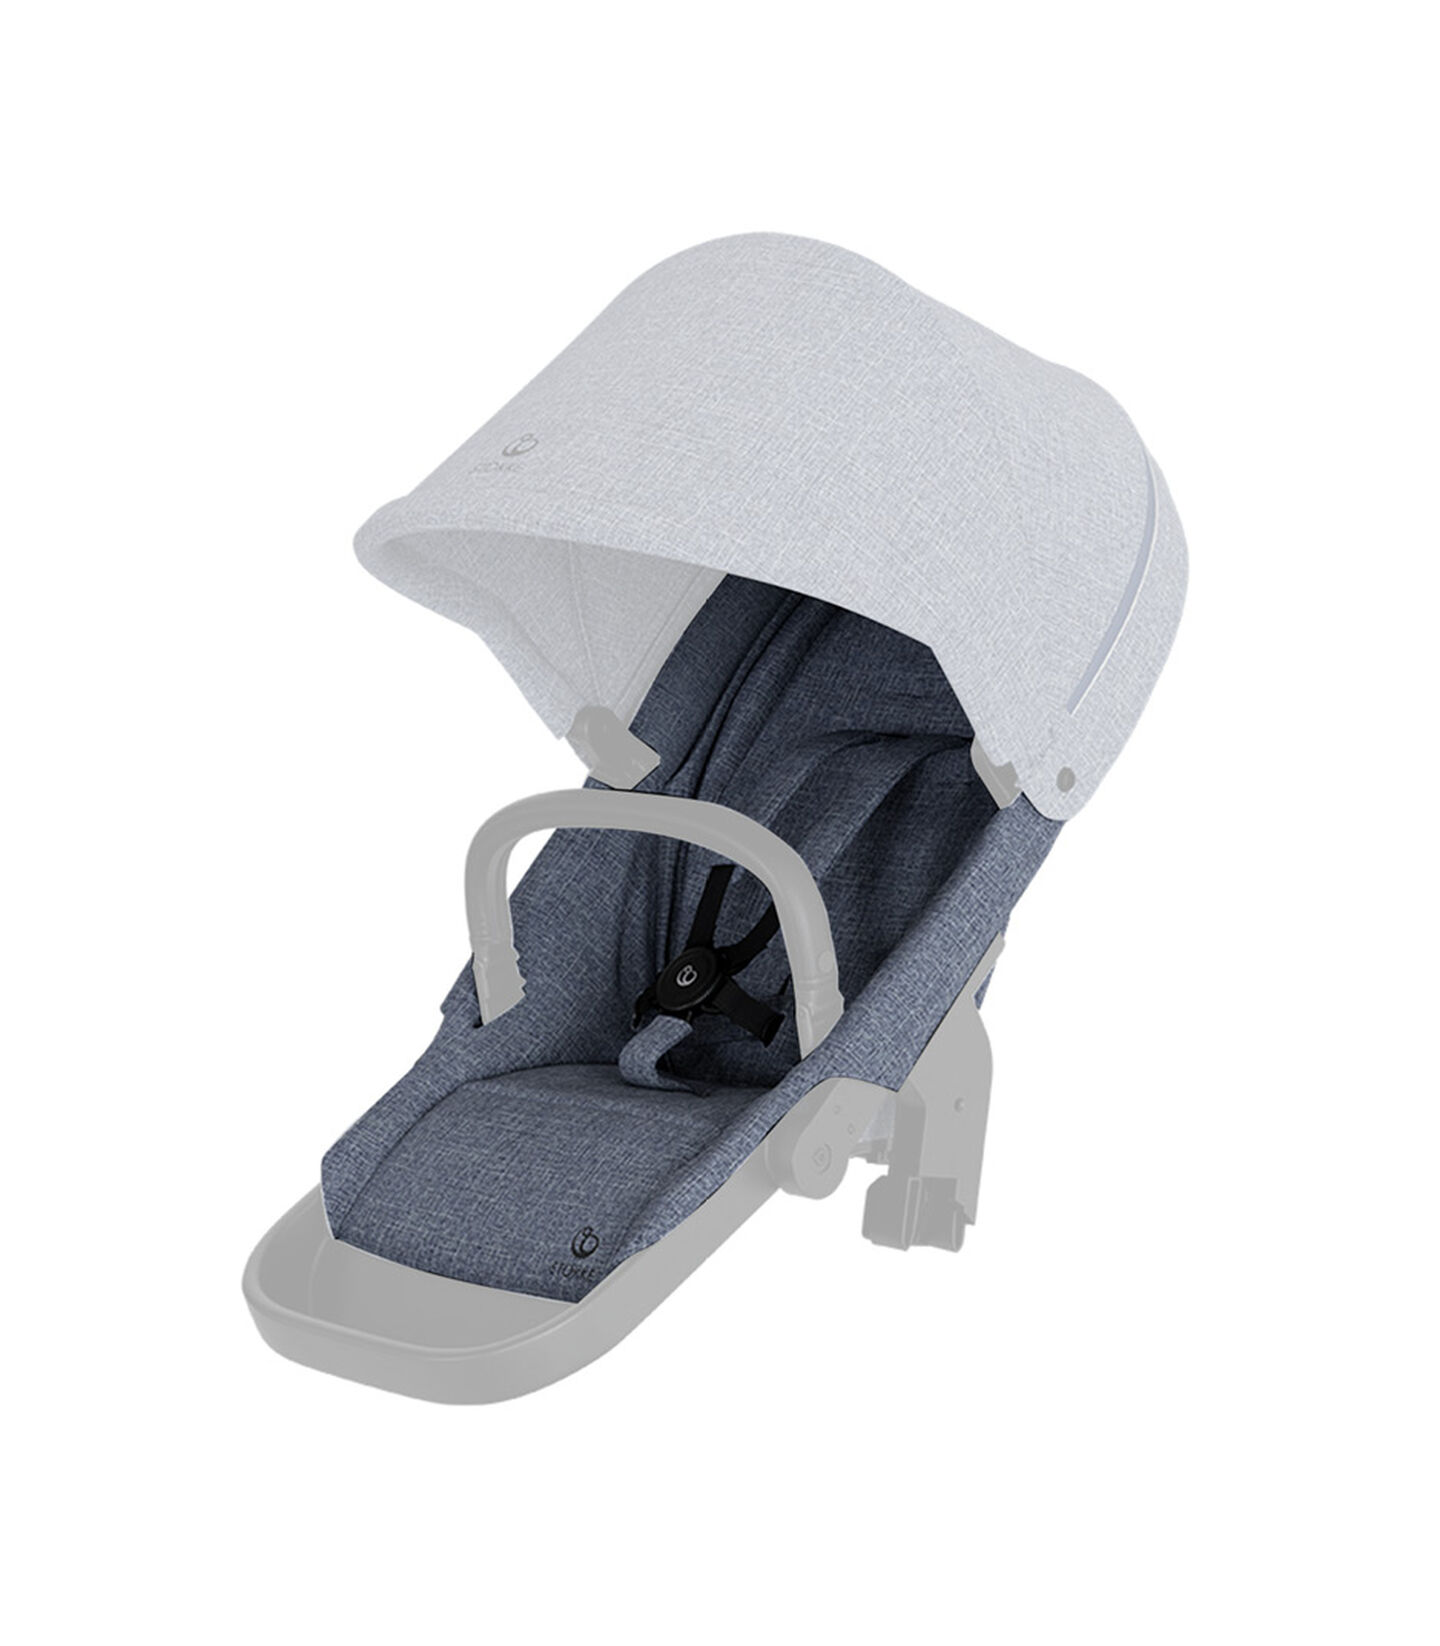 Stokke® Beat seat textile BlueMel wo Can Harness Shpg Basket, Blue Melange, mainview view 2